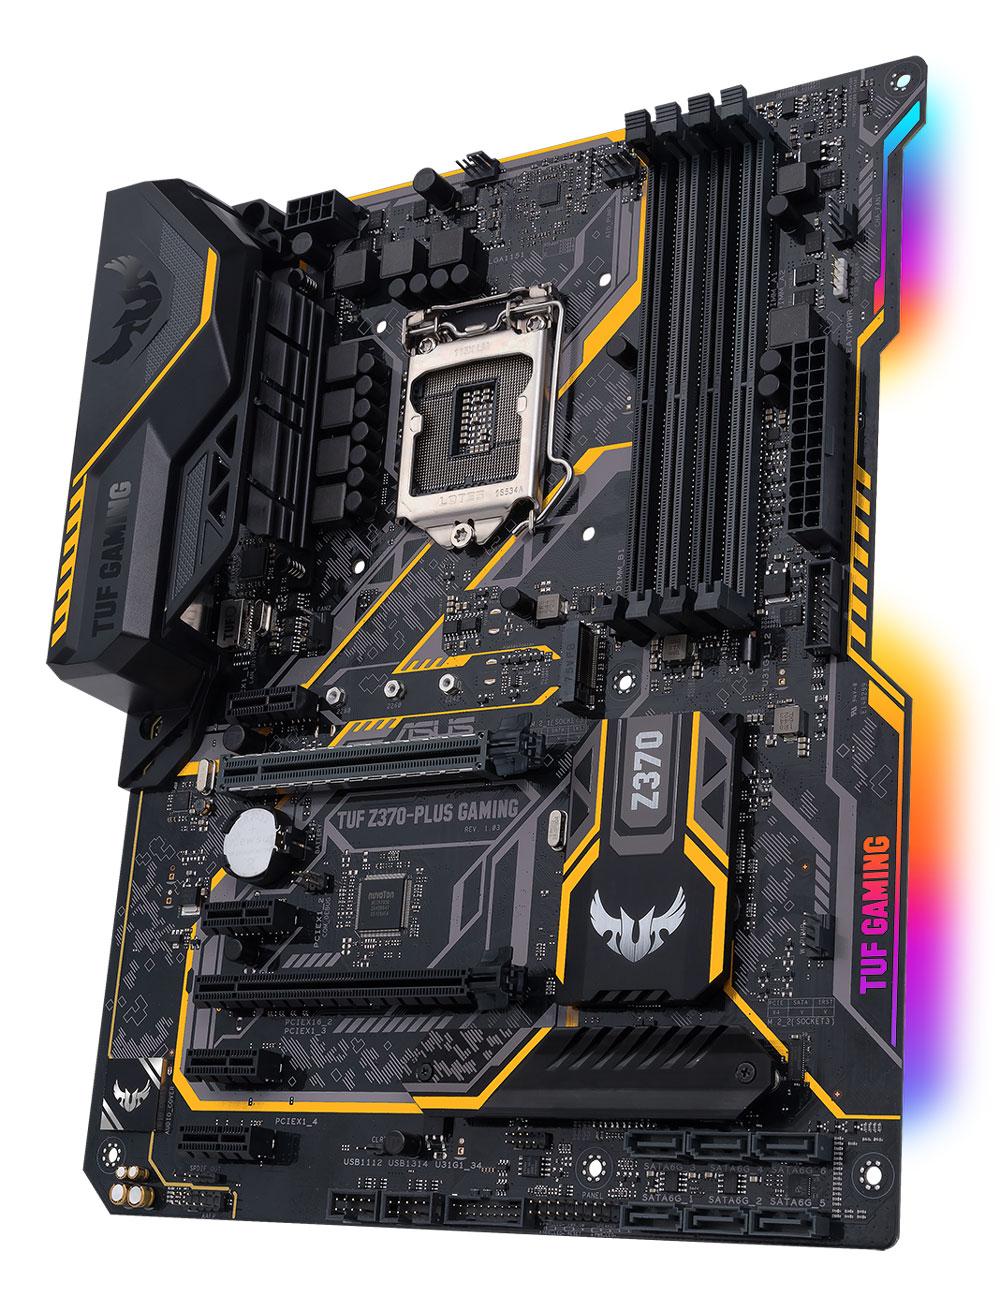 Core i3 9100F TUF Z370-Plus 8GB DDR4 Upgrade Kit